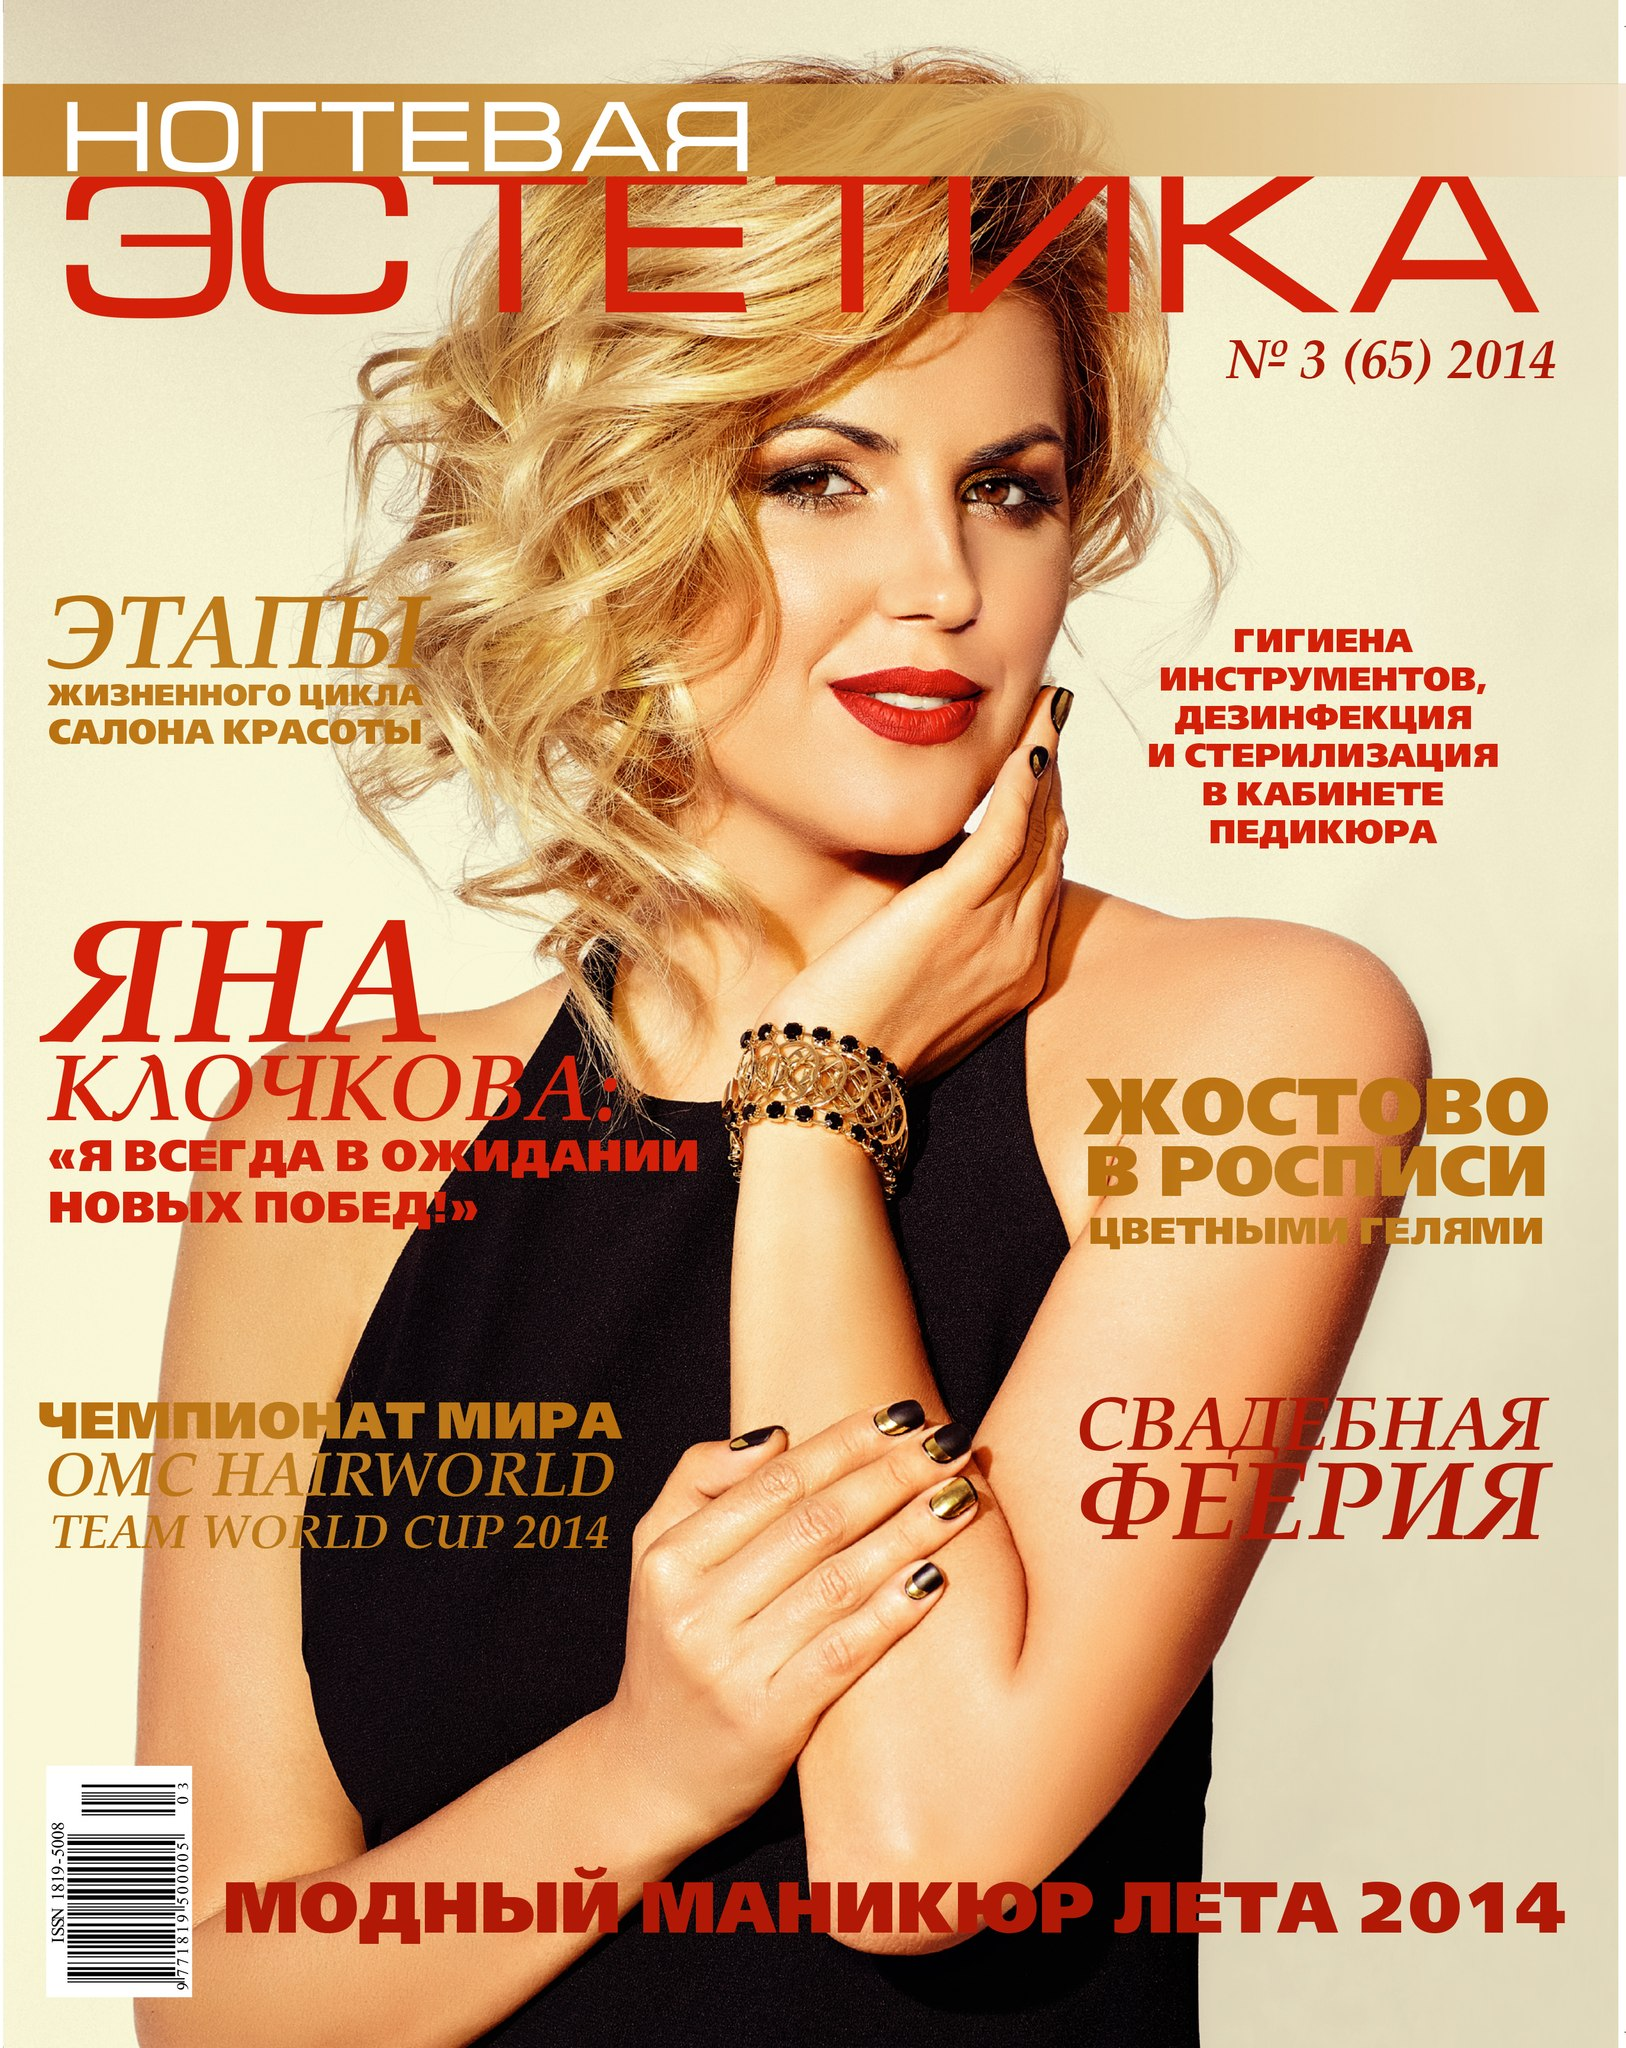 Nogtevaya estetika 2014 Klochkova Яна Клочкова обложка Алла Кравченко